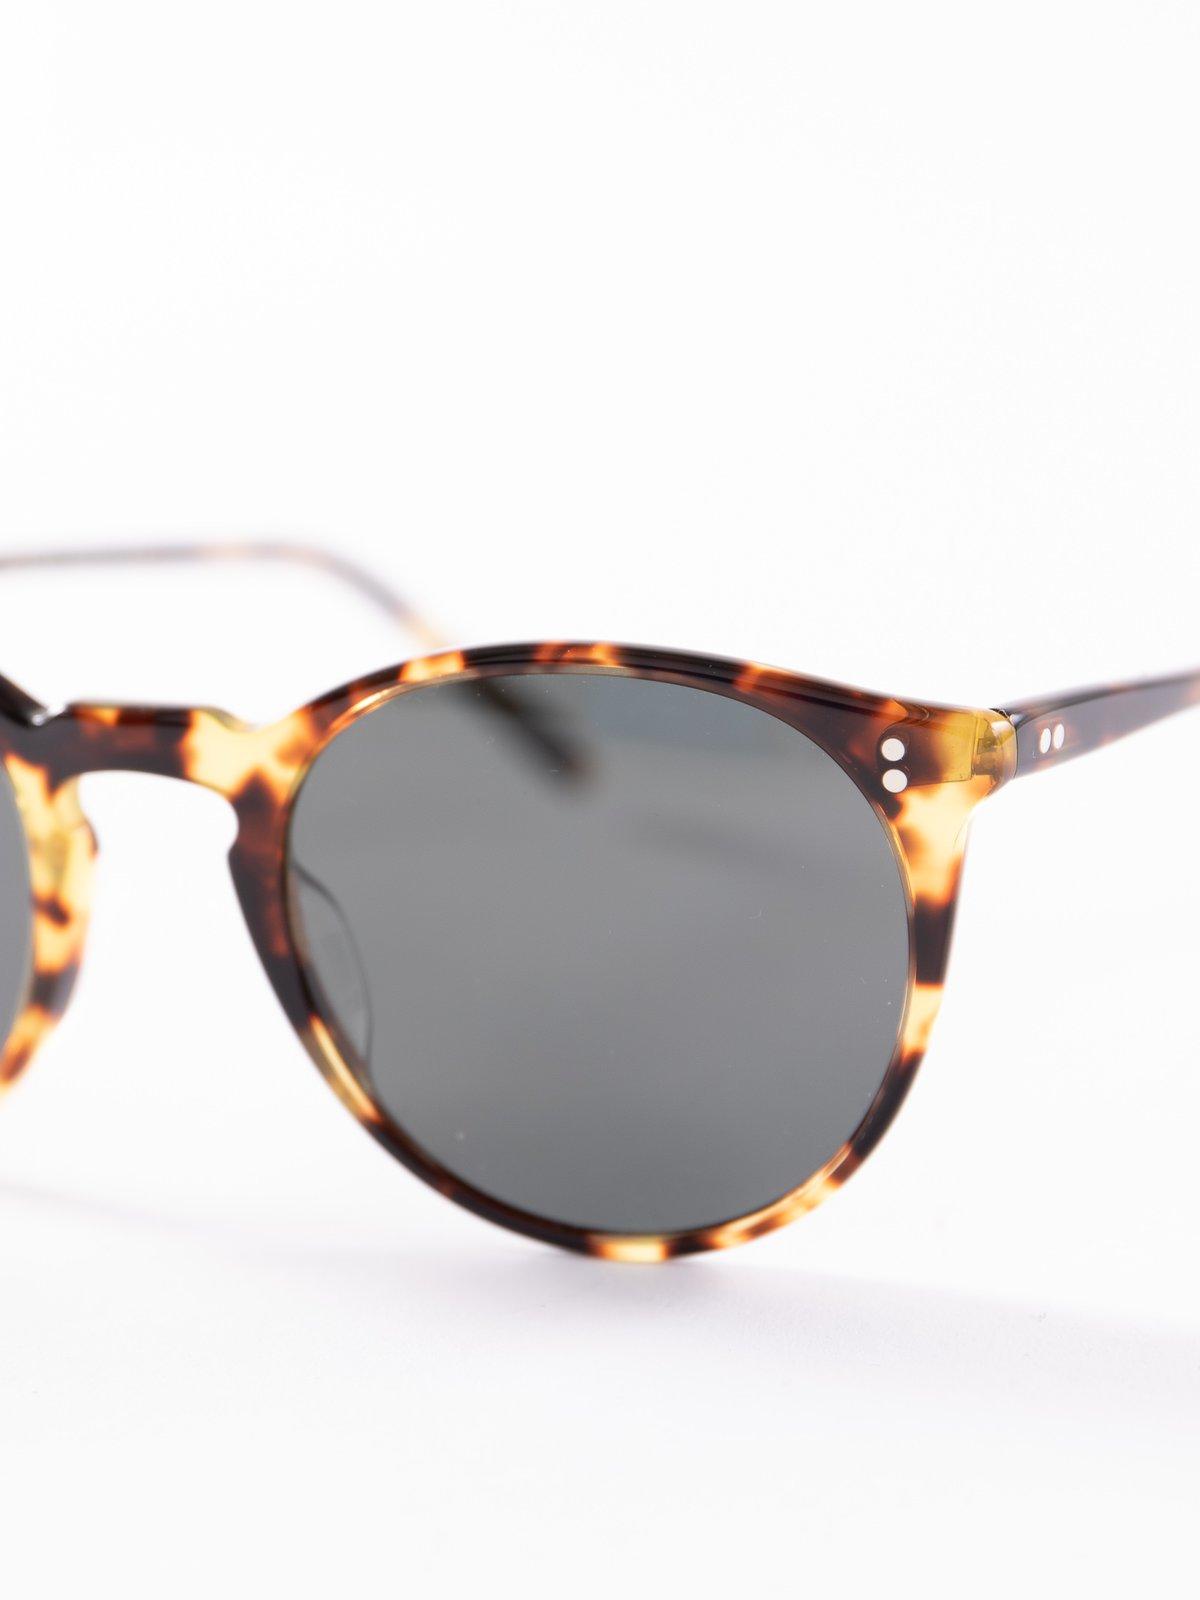 Vintage DTB/Dark Grey Polar O'Malley Sunglasses - Image 3